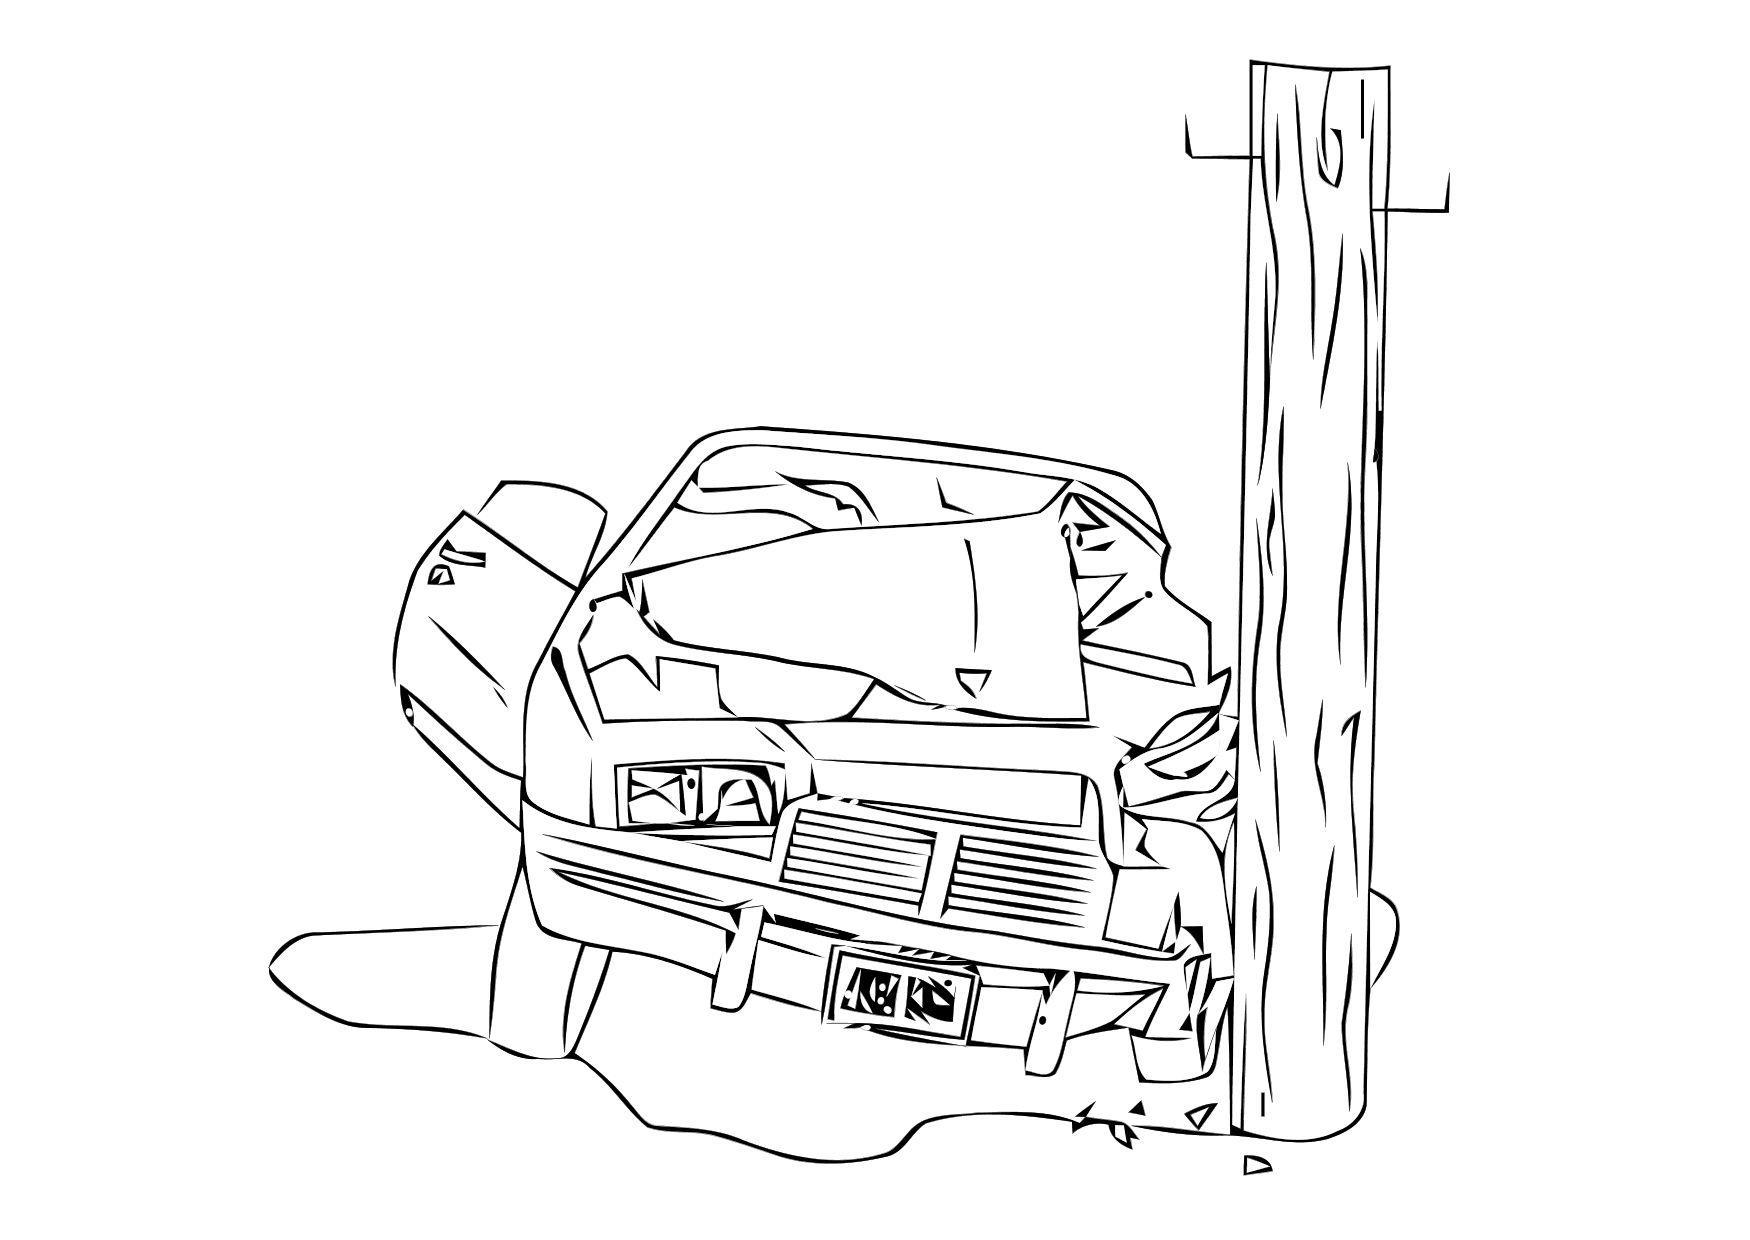 Dibujo para colorear Choque - accidente - Img 11406